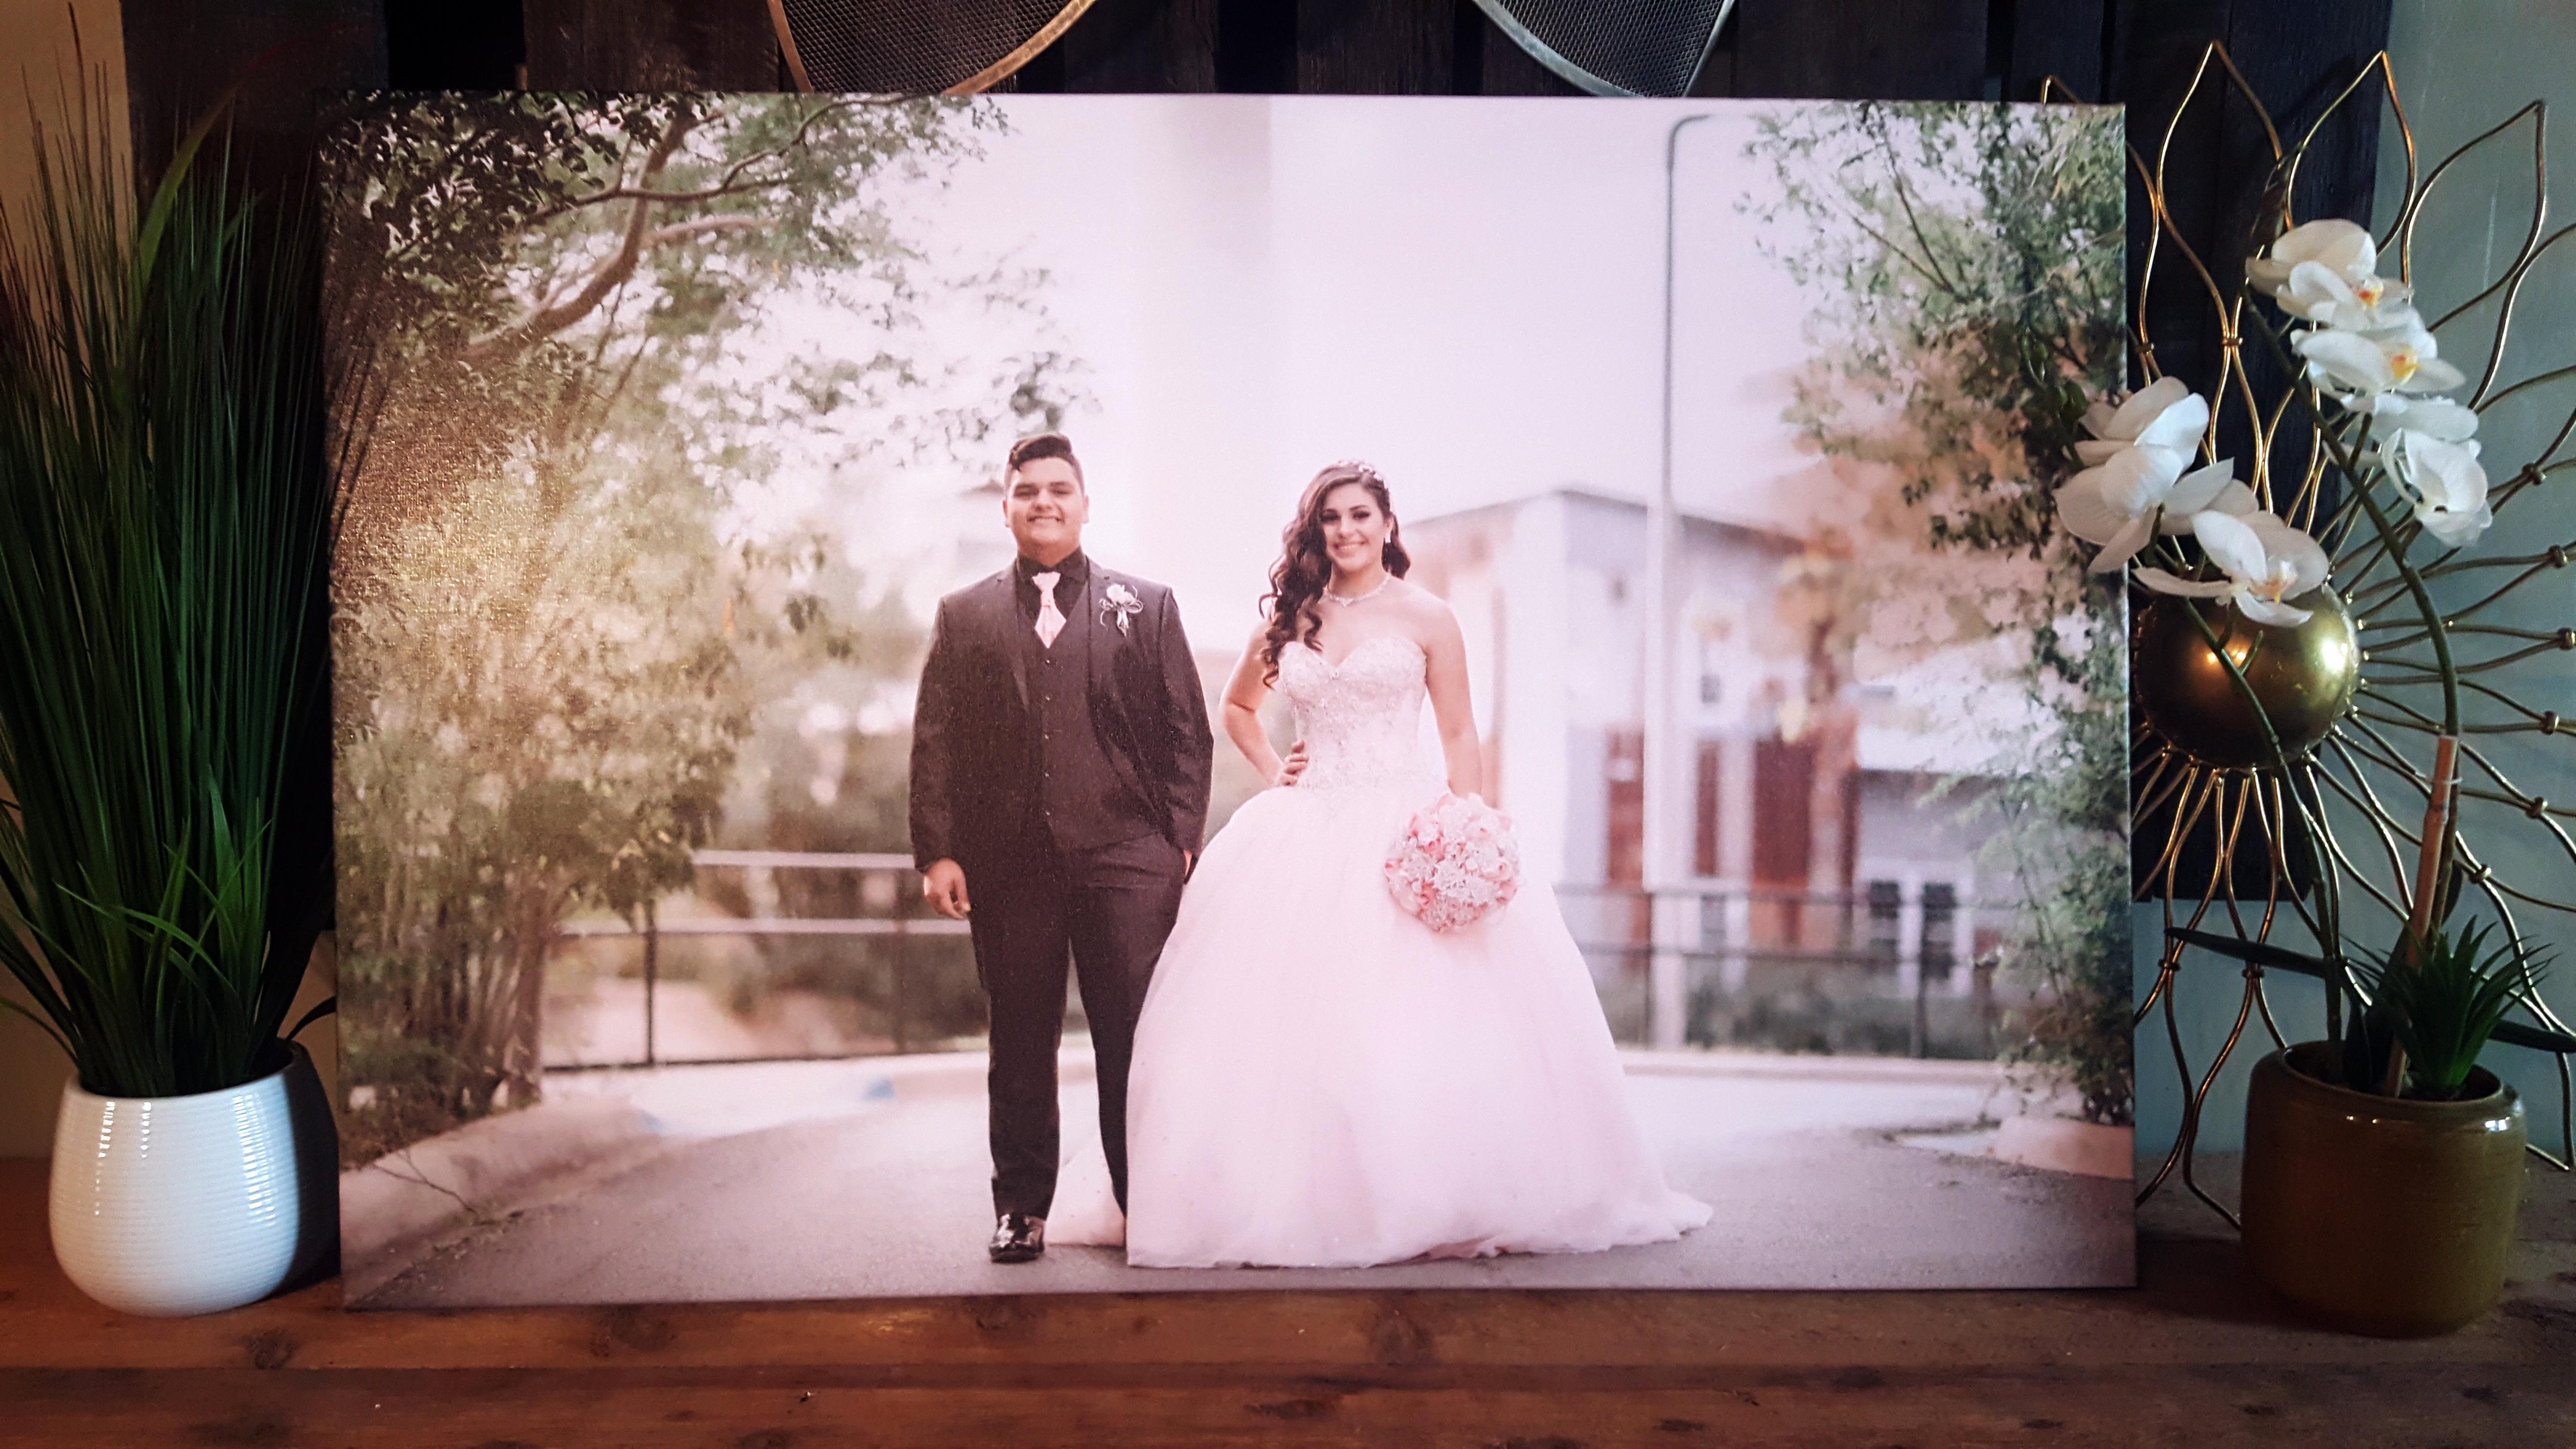 Large 24 x 36 photo canvas $95